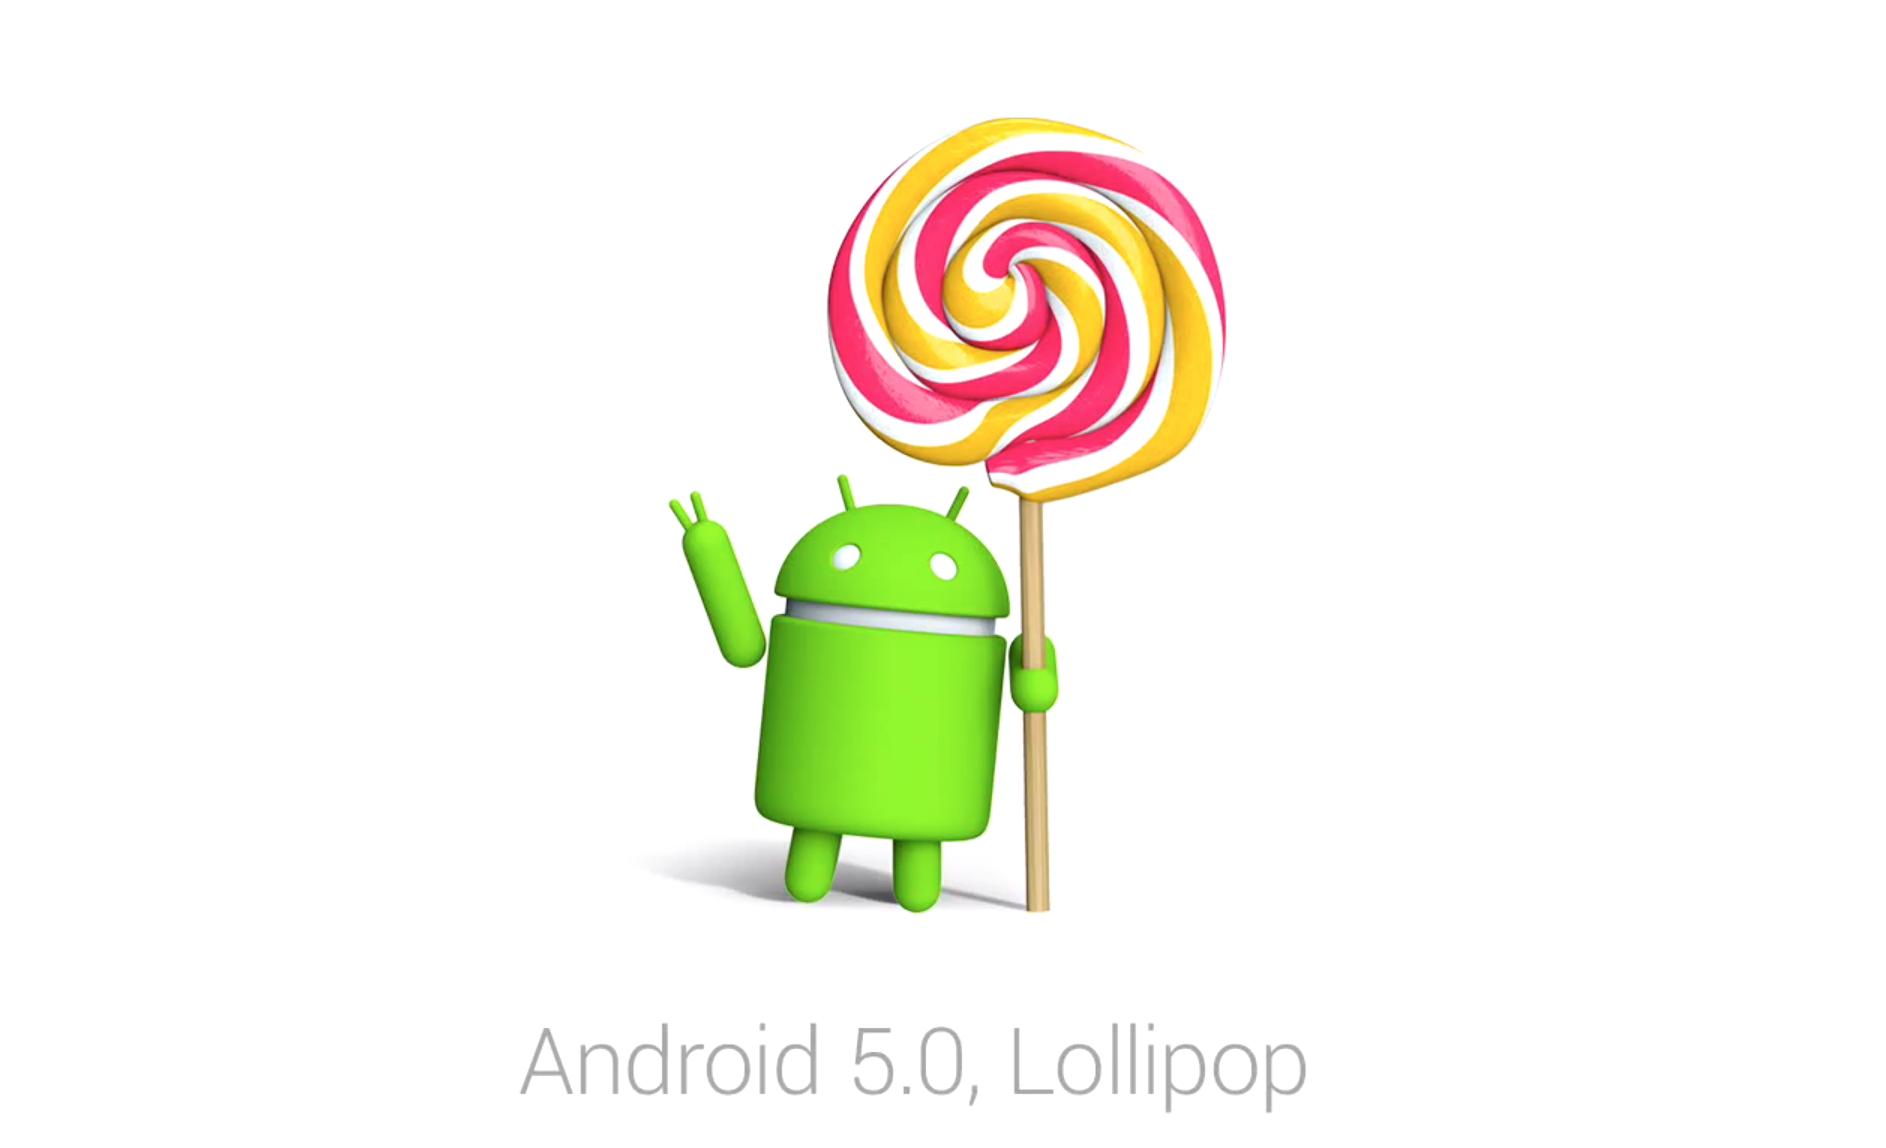 Android 5.0 Lollipop Bugdroid1